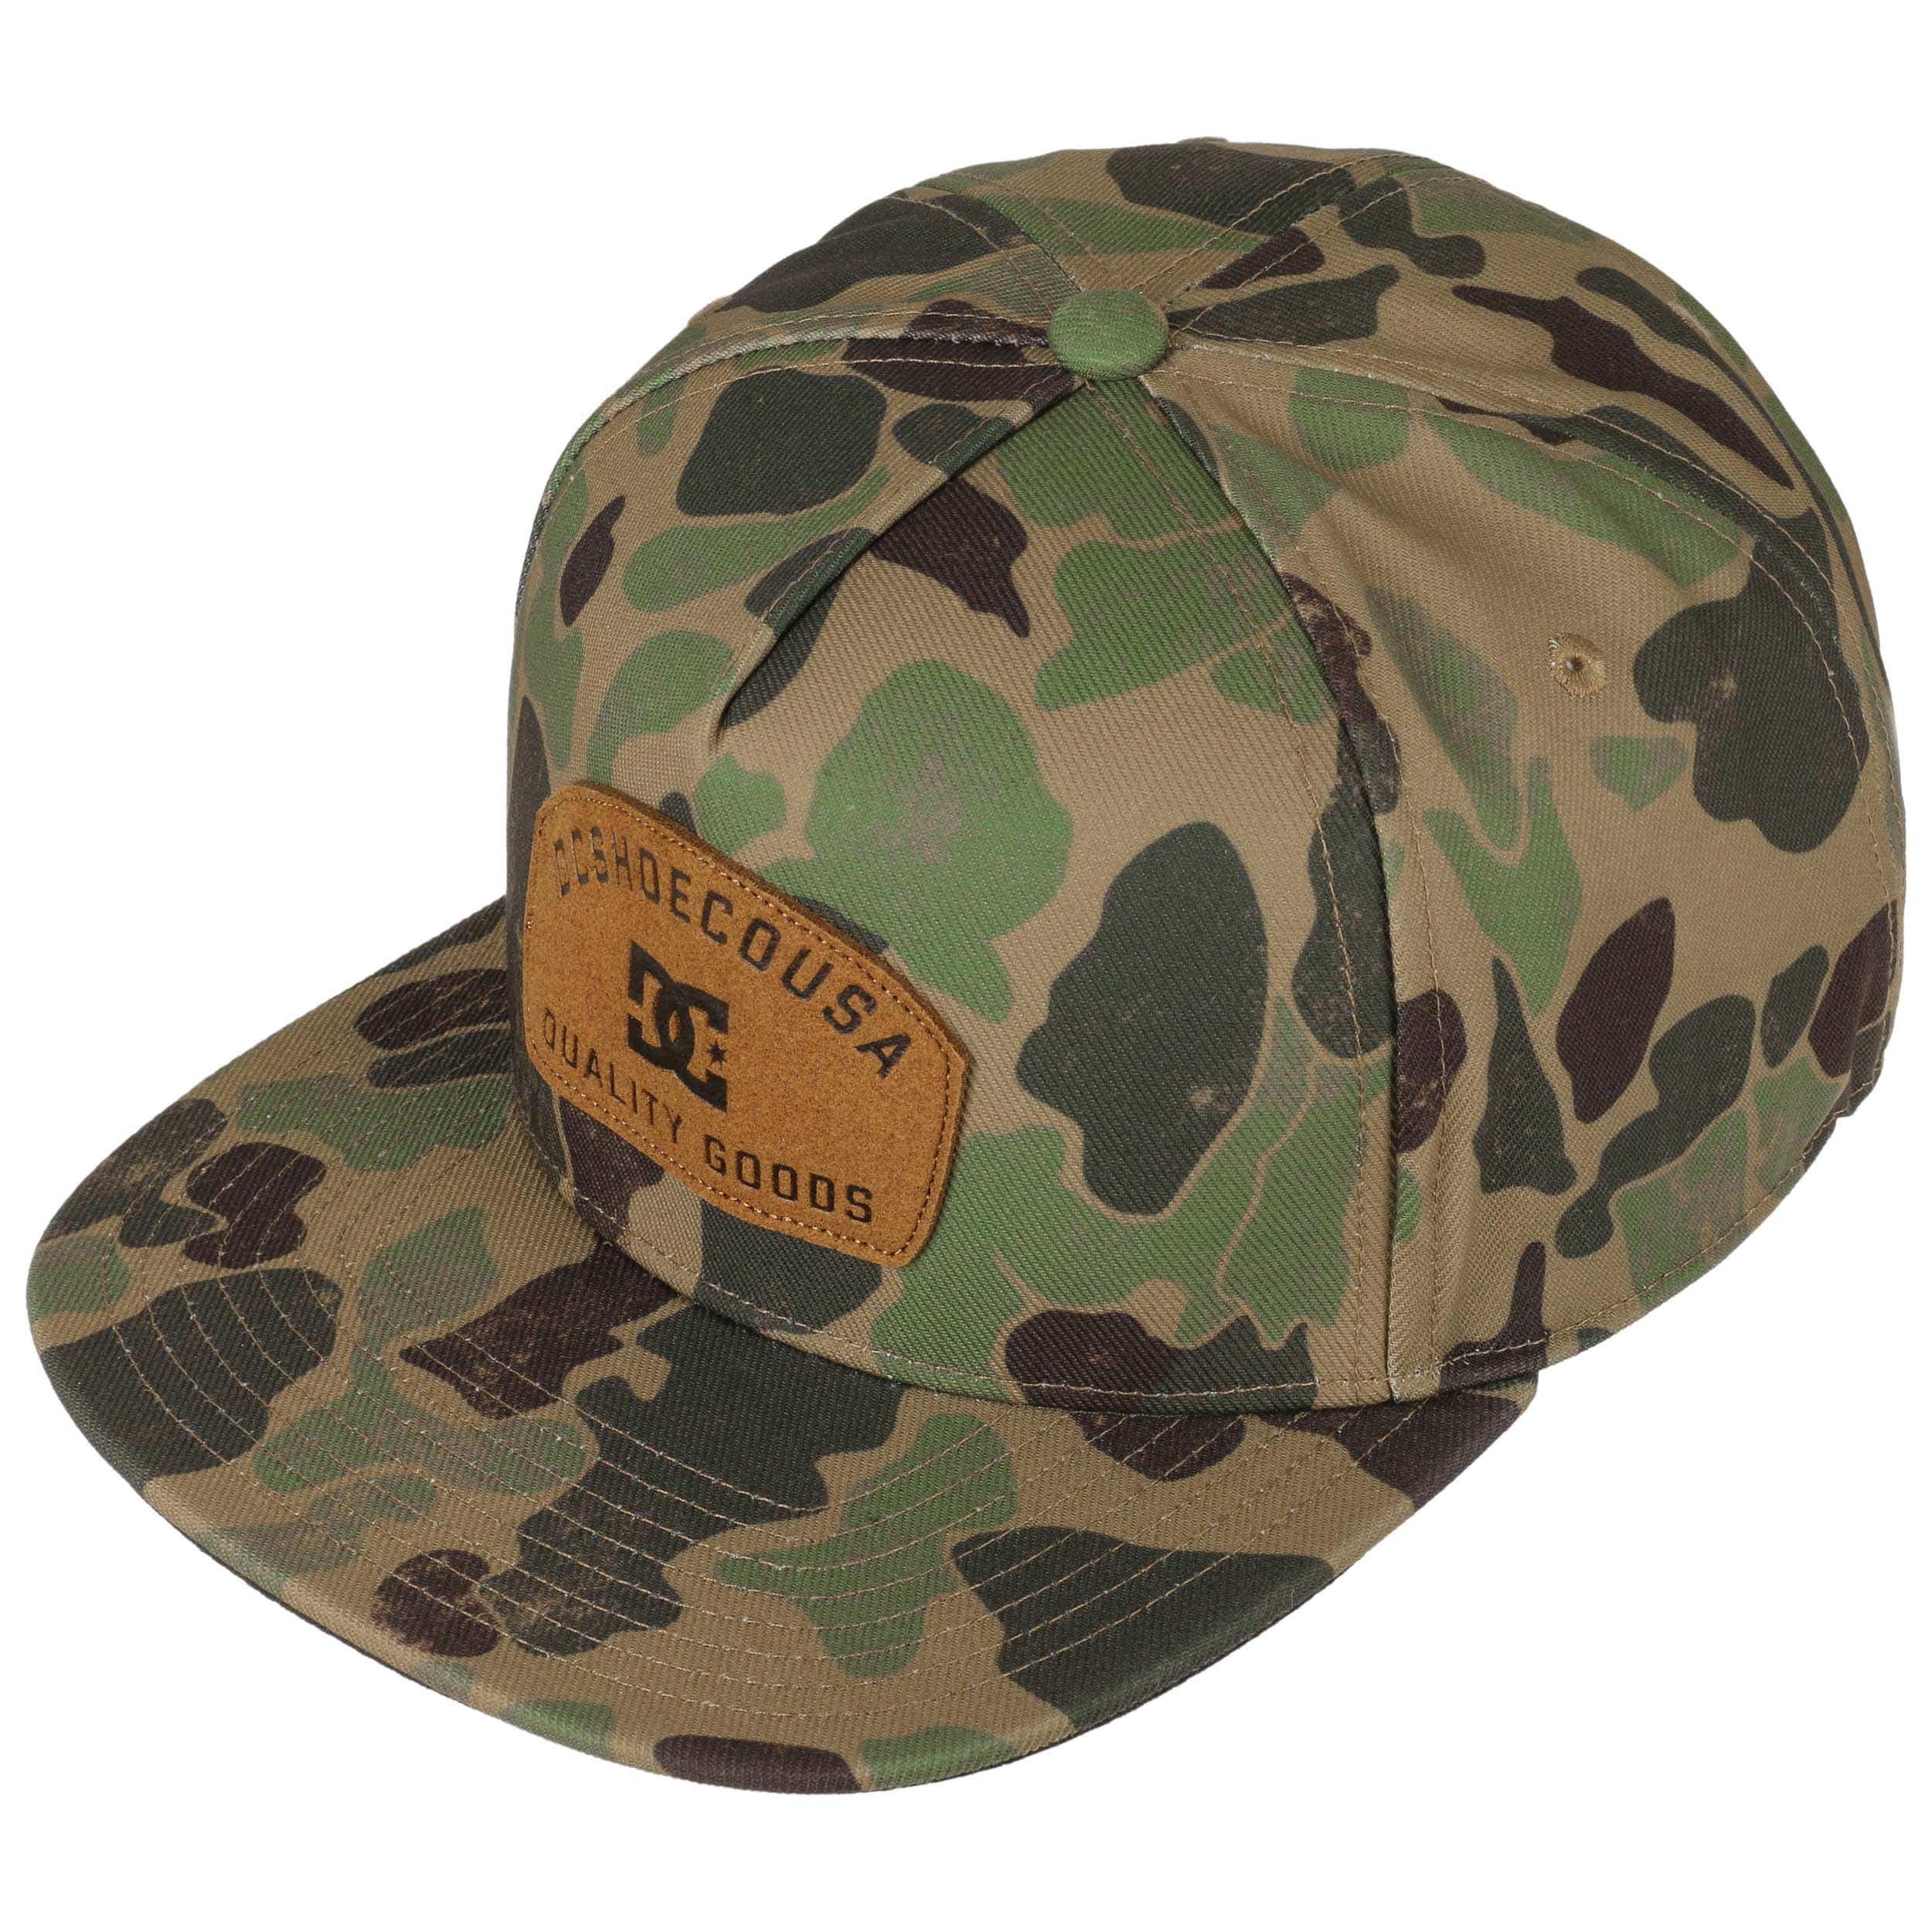 buy online 16bda 3869d ... Betterman Snapback Cap by DC Shoes Co - camouflage 1 ...